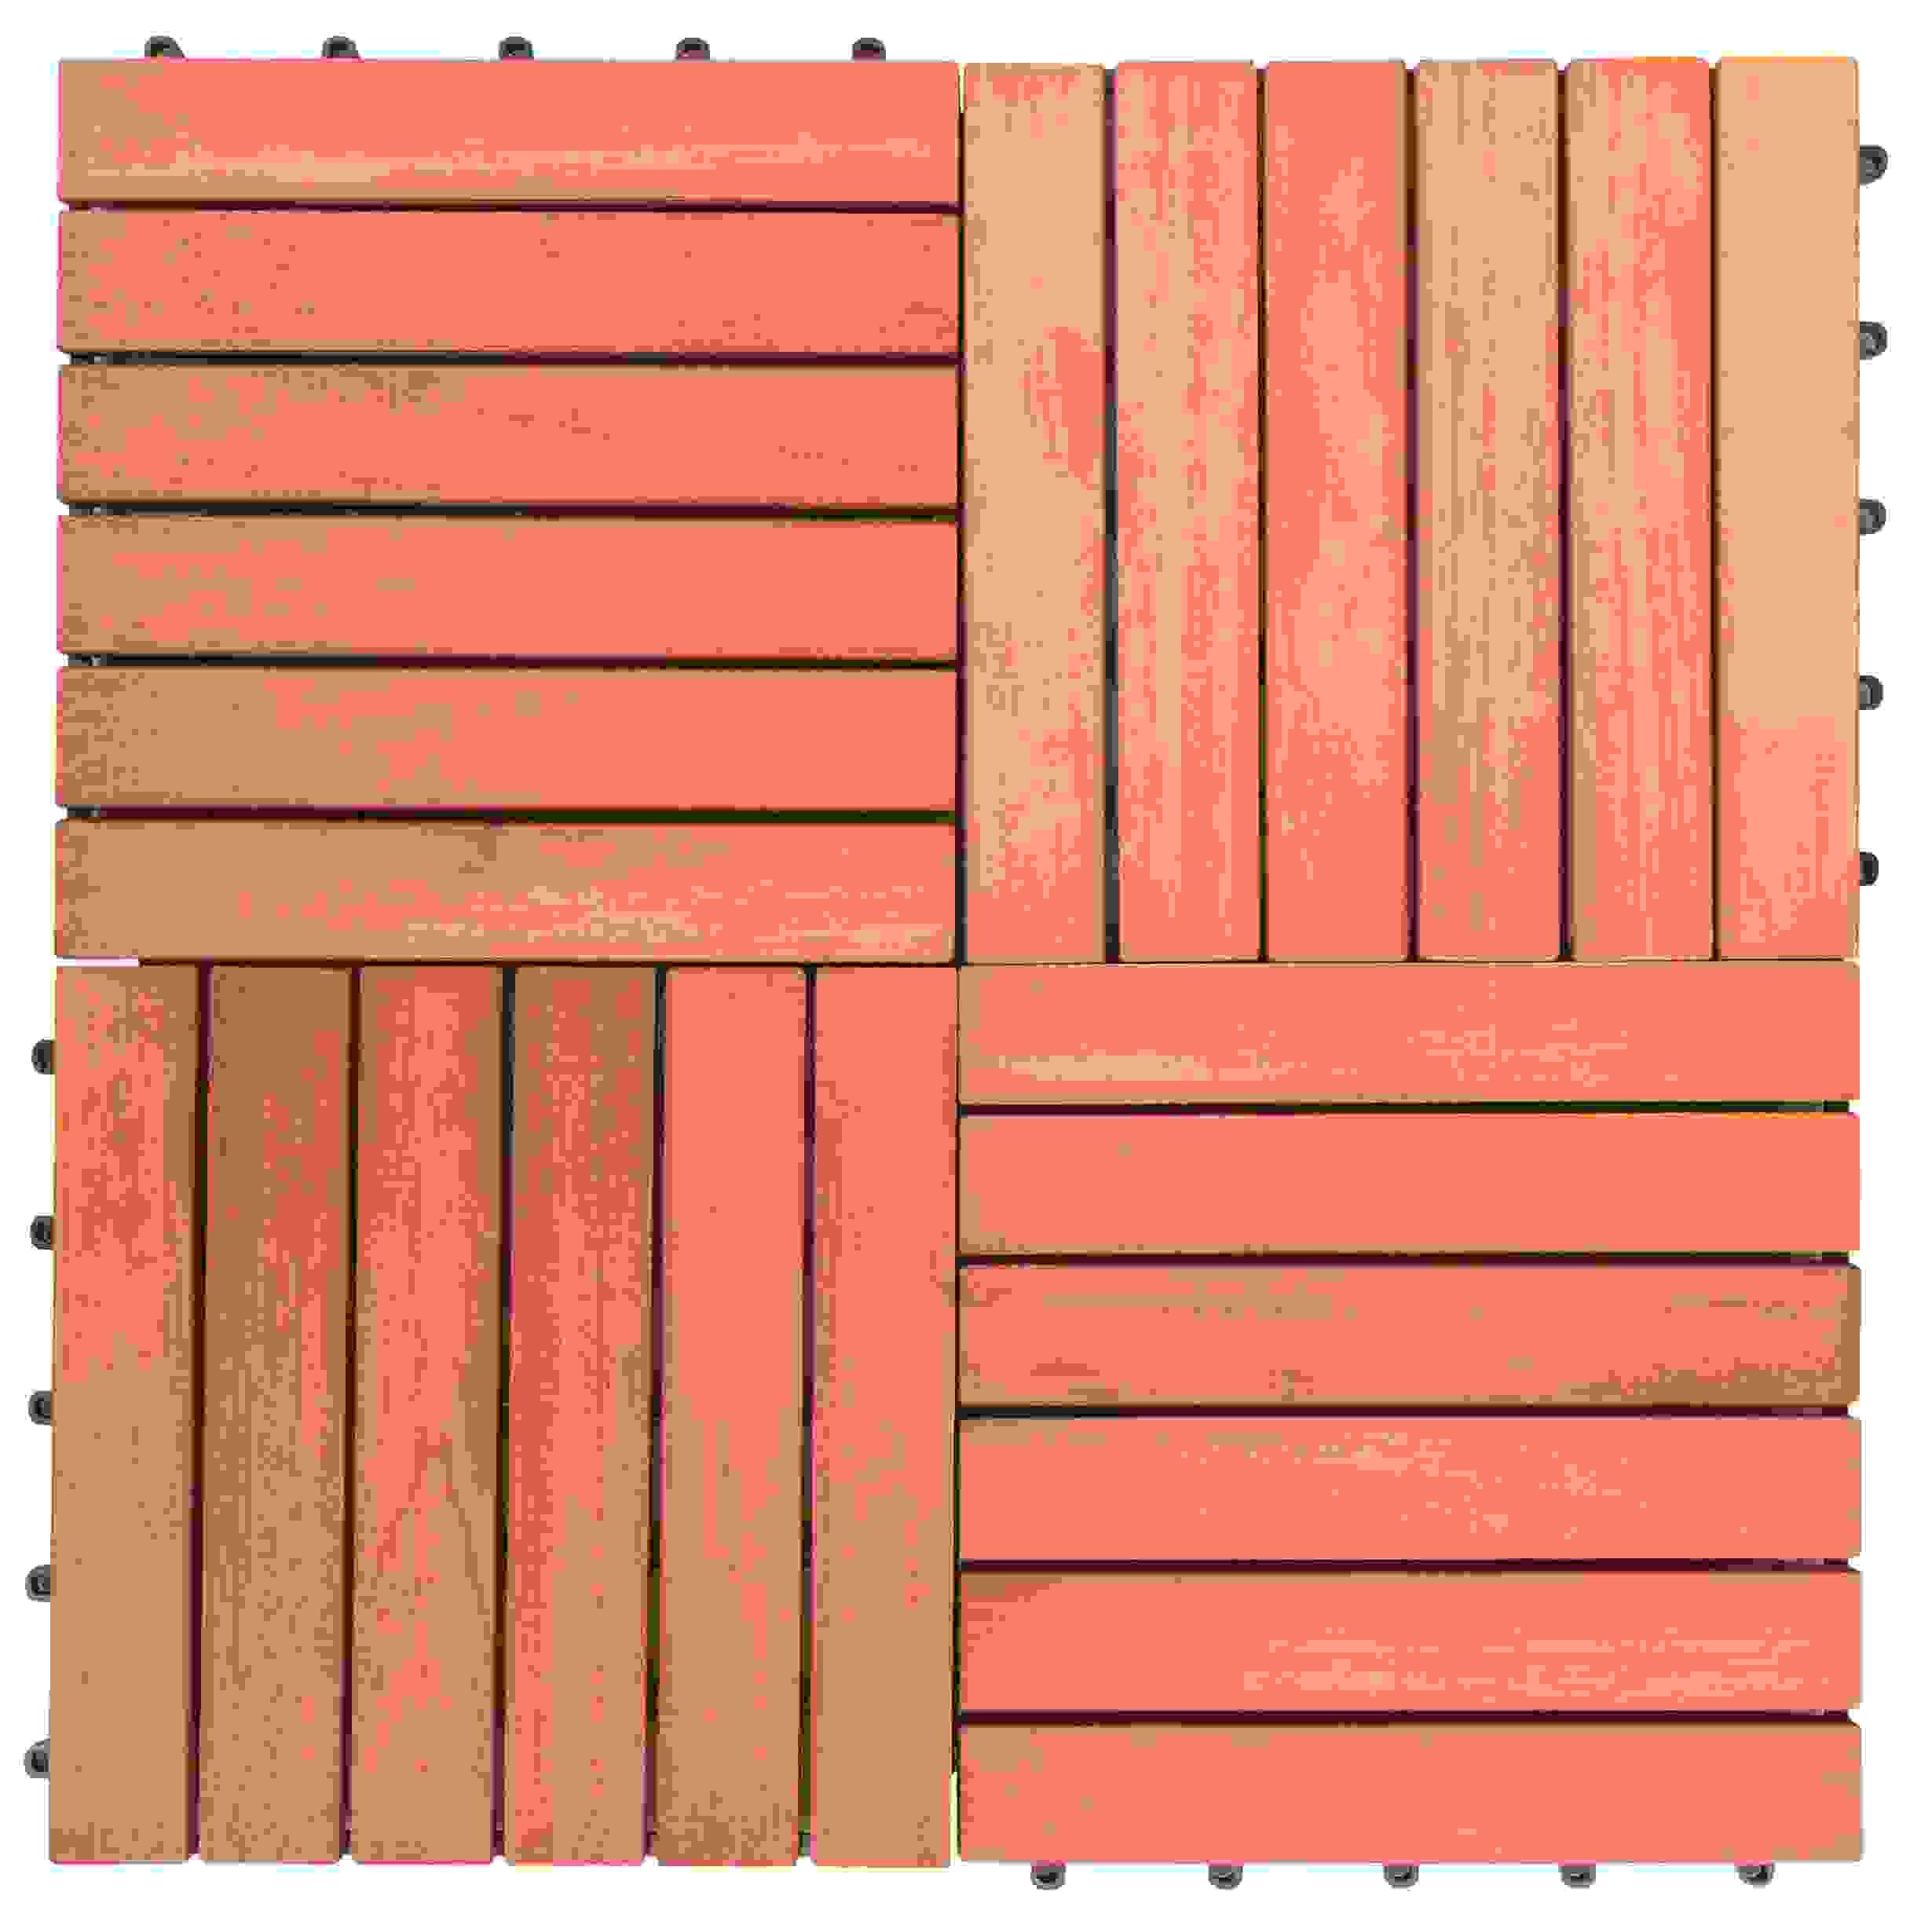 Outdoor Patio 6-Slat Eucalyptus Interlocking Deck Tile (Set of 10 Tiles)